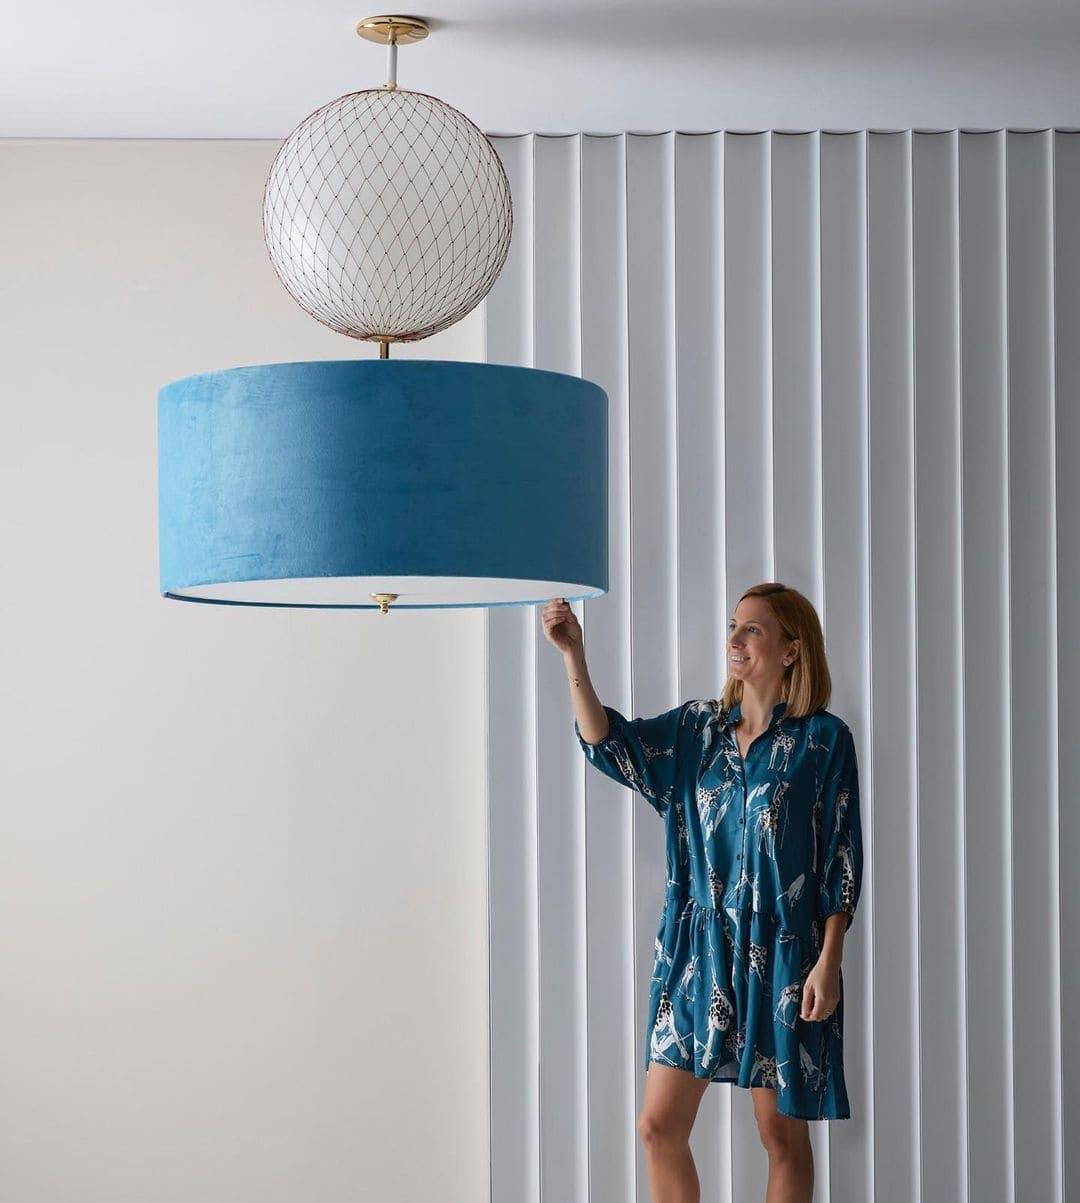 lámpara de Peralta